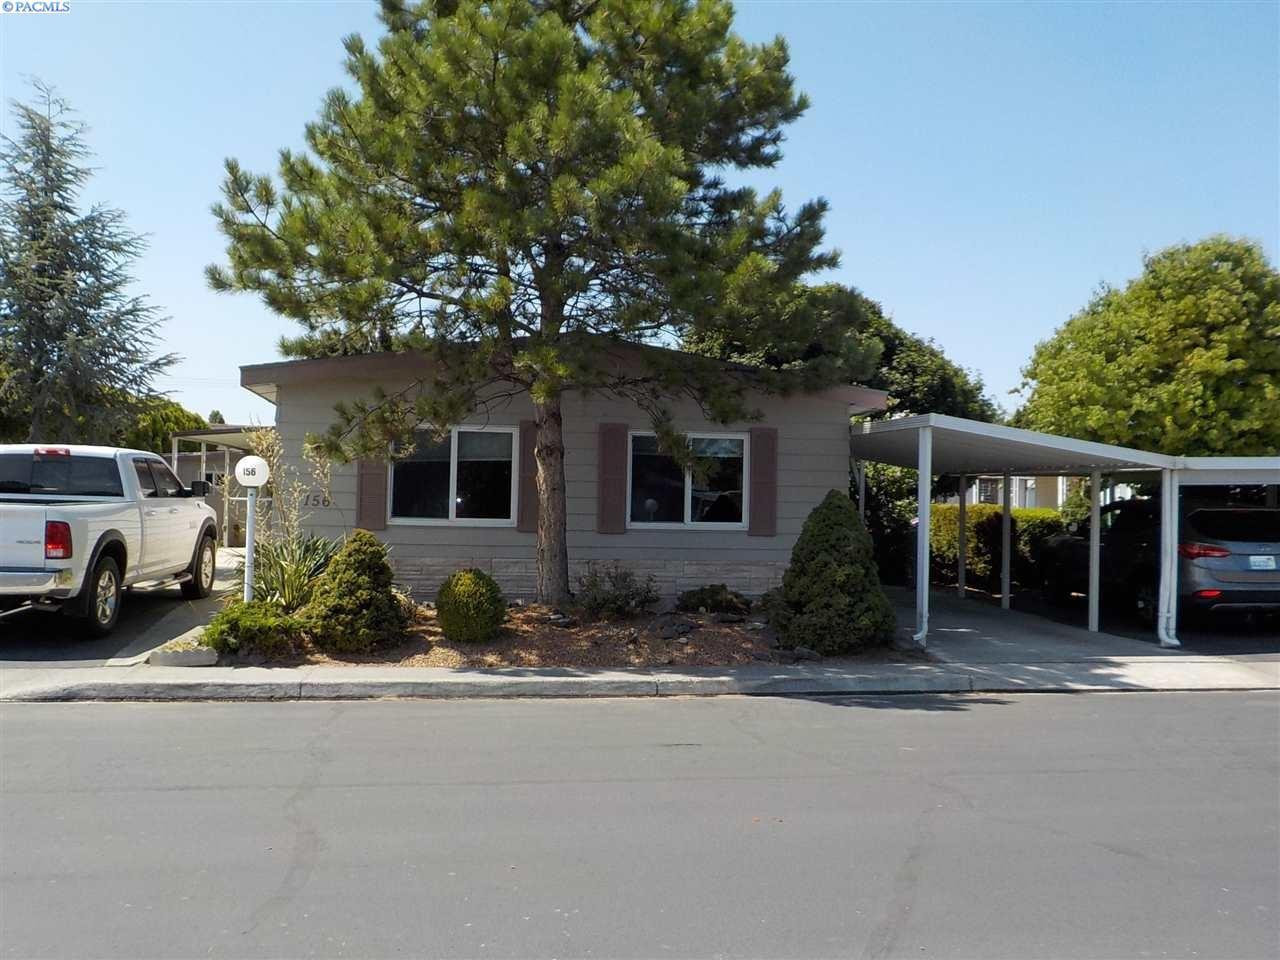 Photo of 7901 W Clearwater #156, Kennewick, WA 99336 (MLS # 247220)